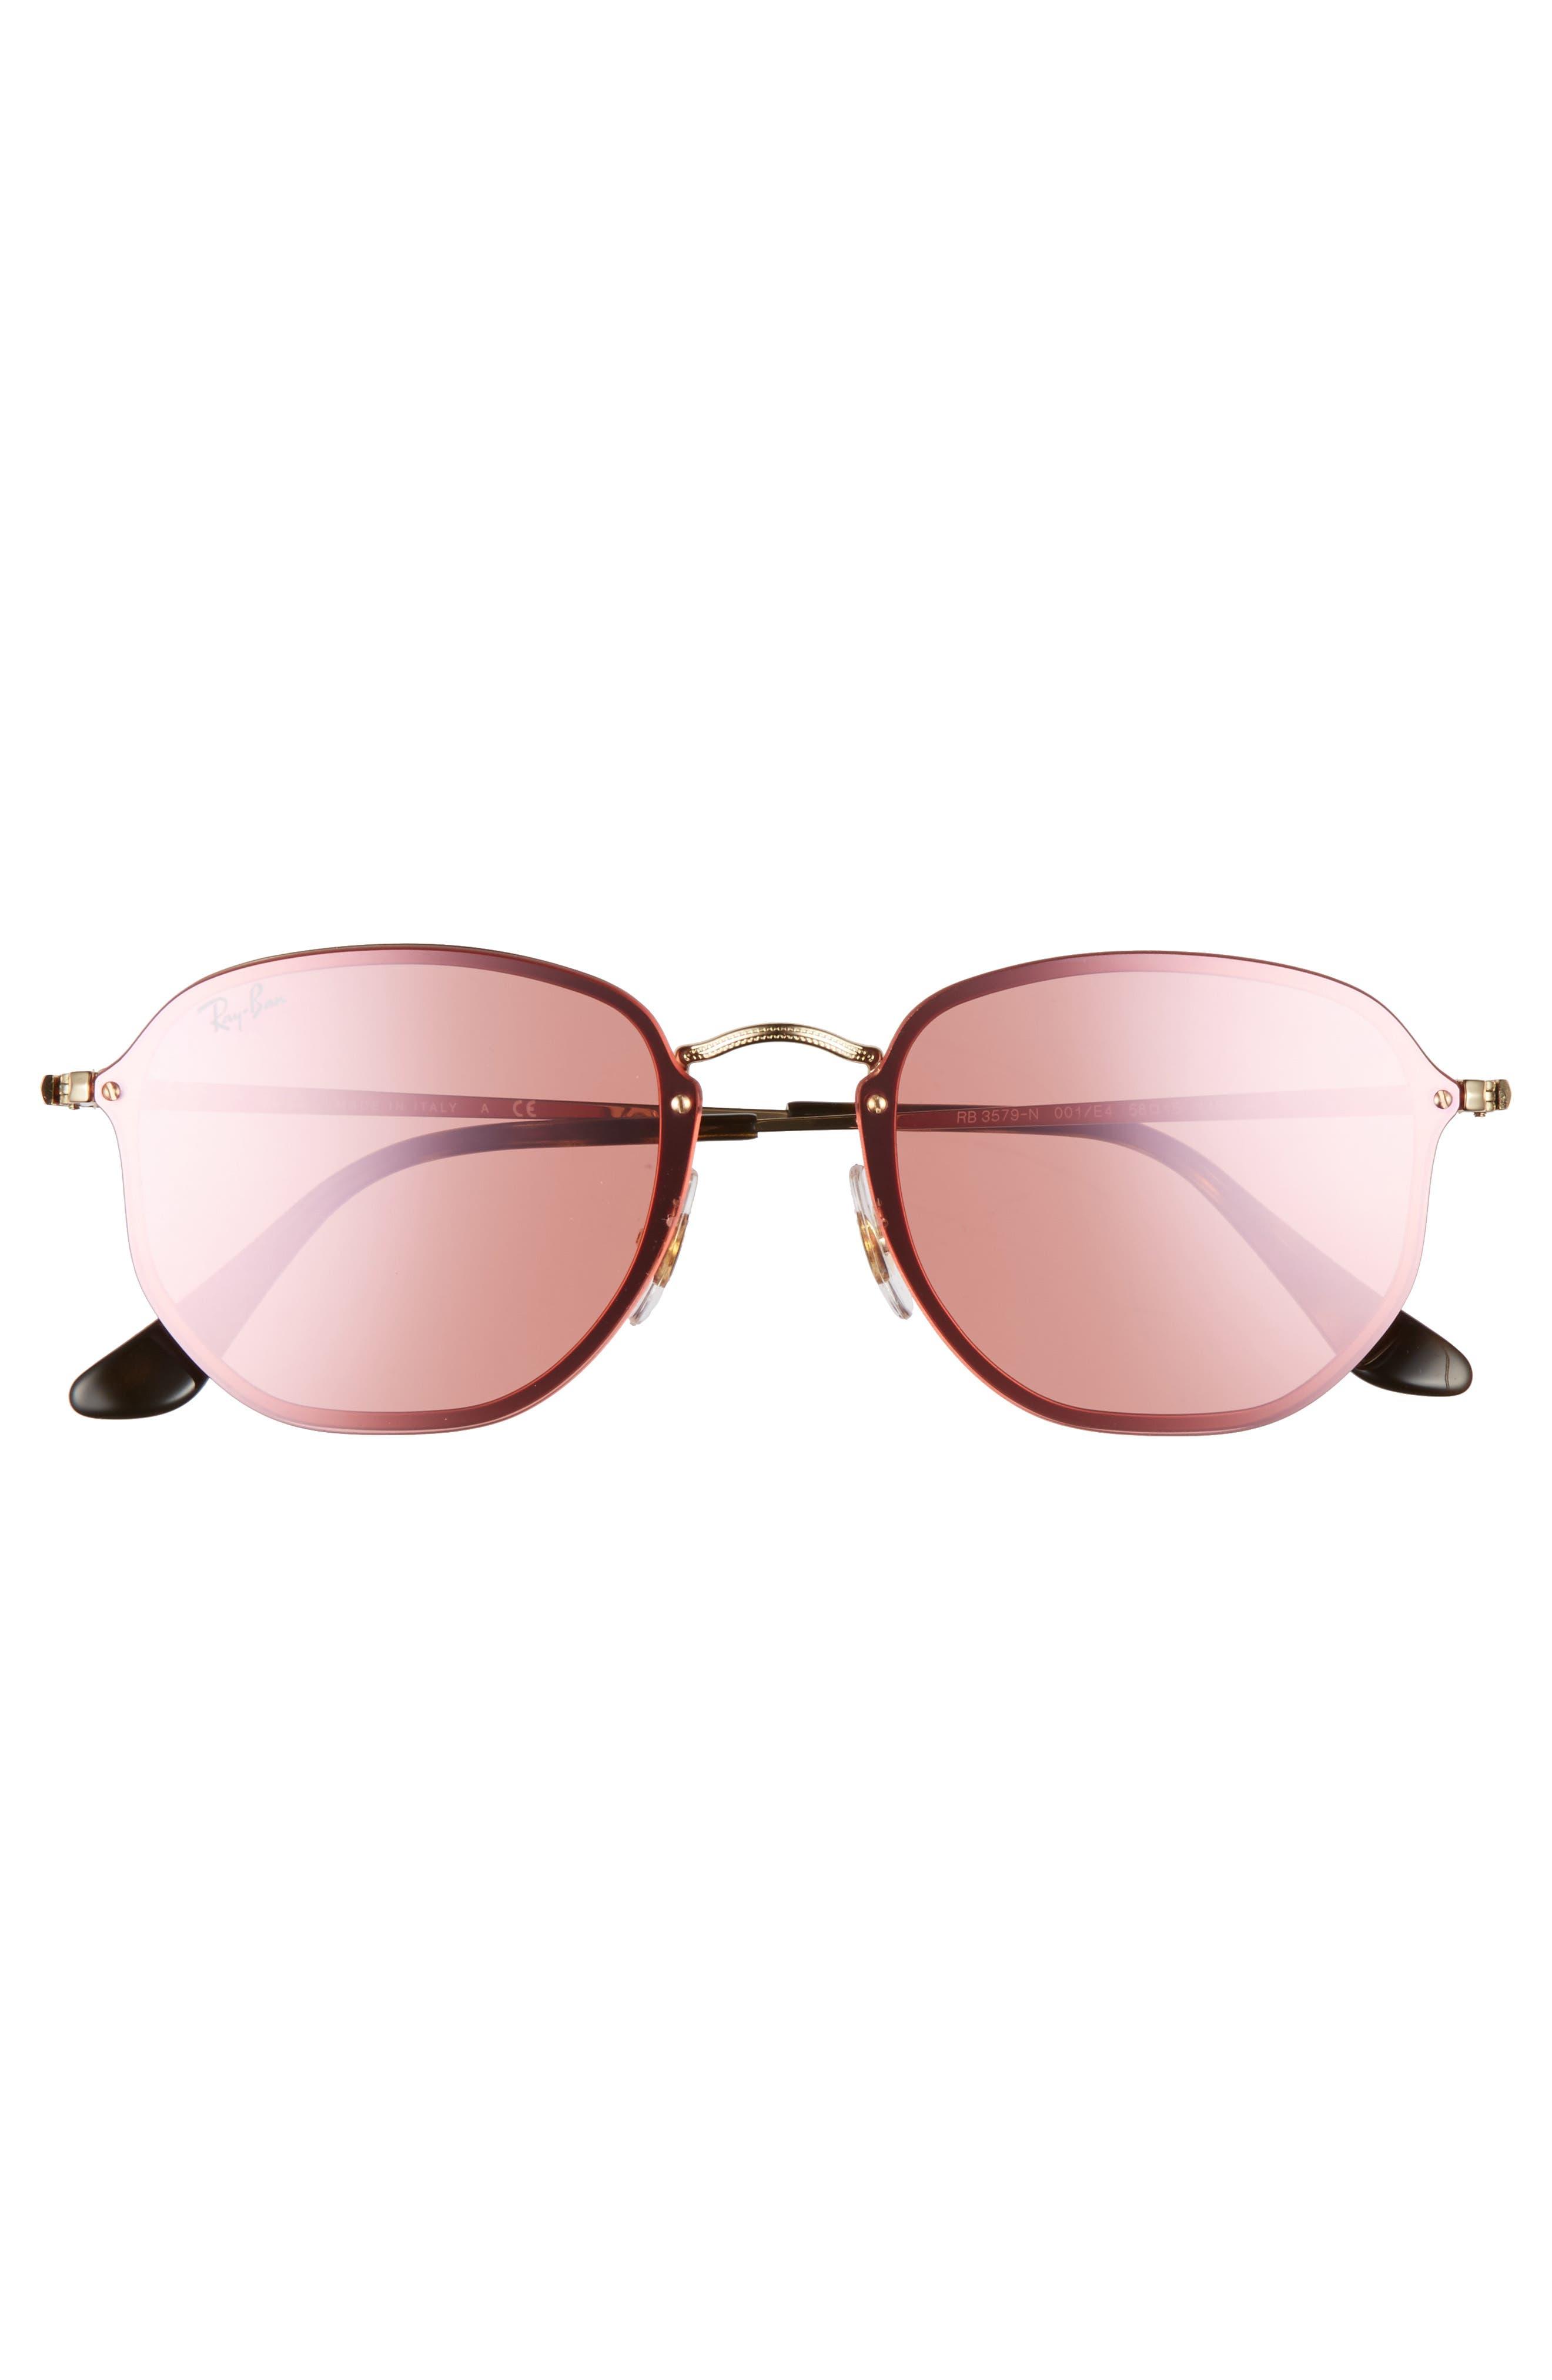 58mm Round Sunglasses,                             Alternate thumbnail 6, color,